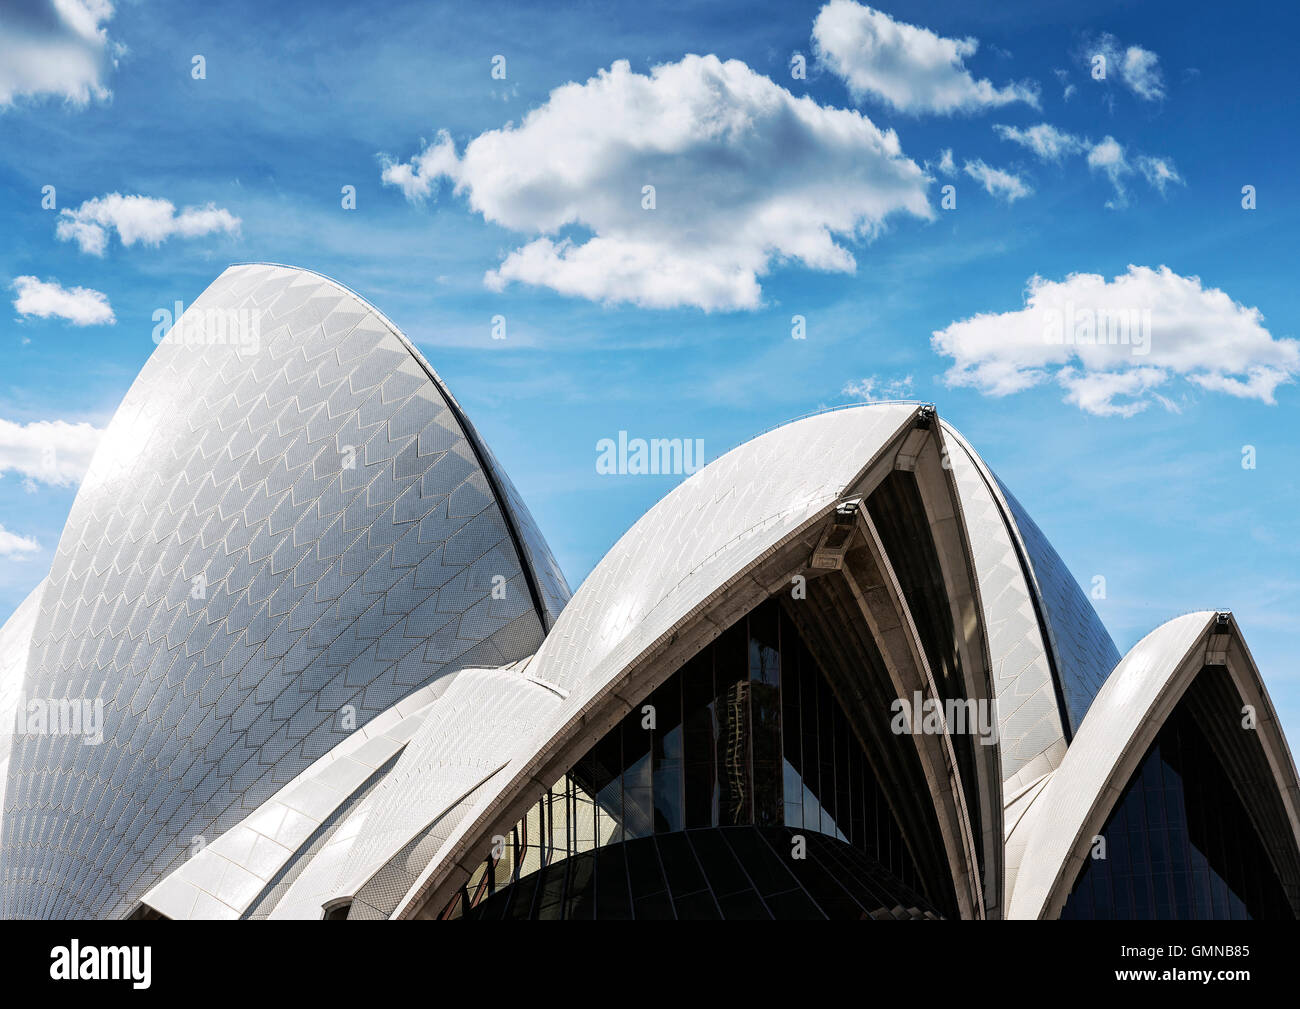 Modern Day Architecture famous sydney opera house landmark modern architecture detail in